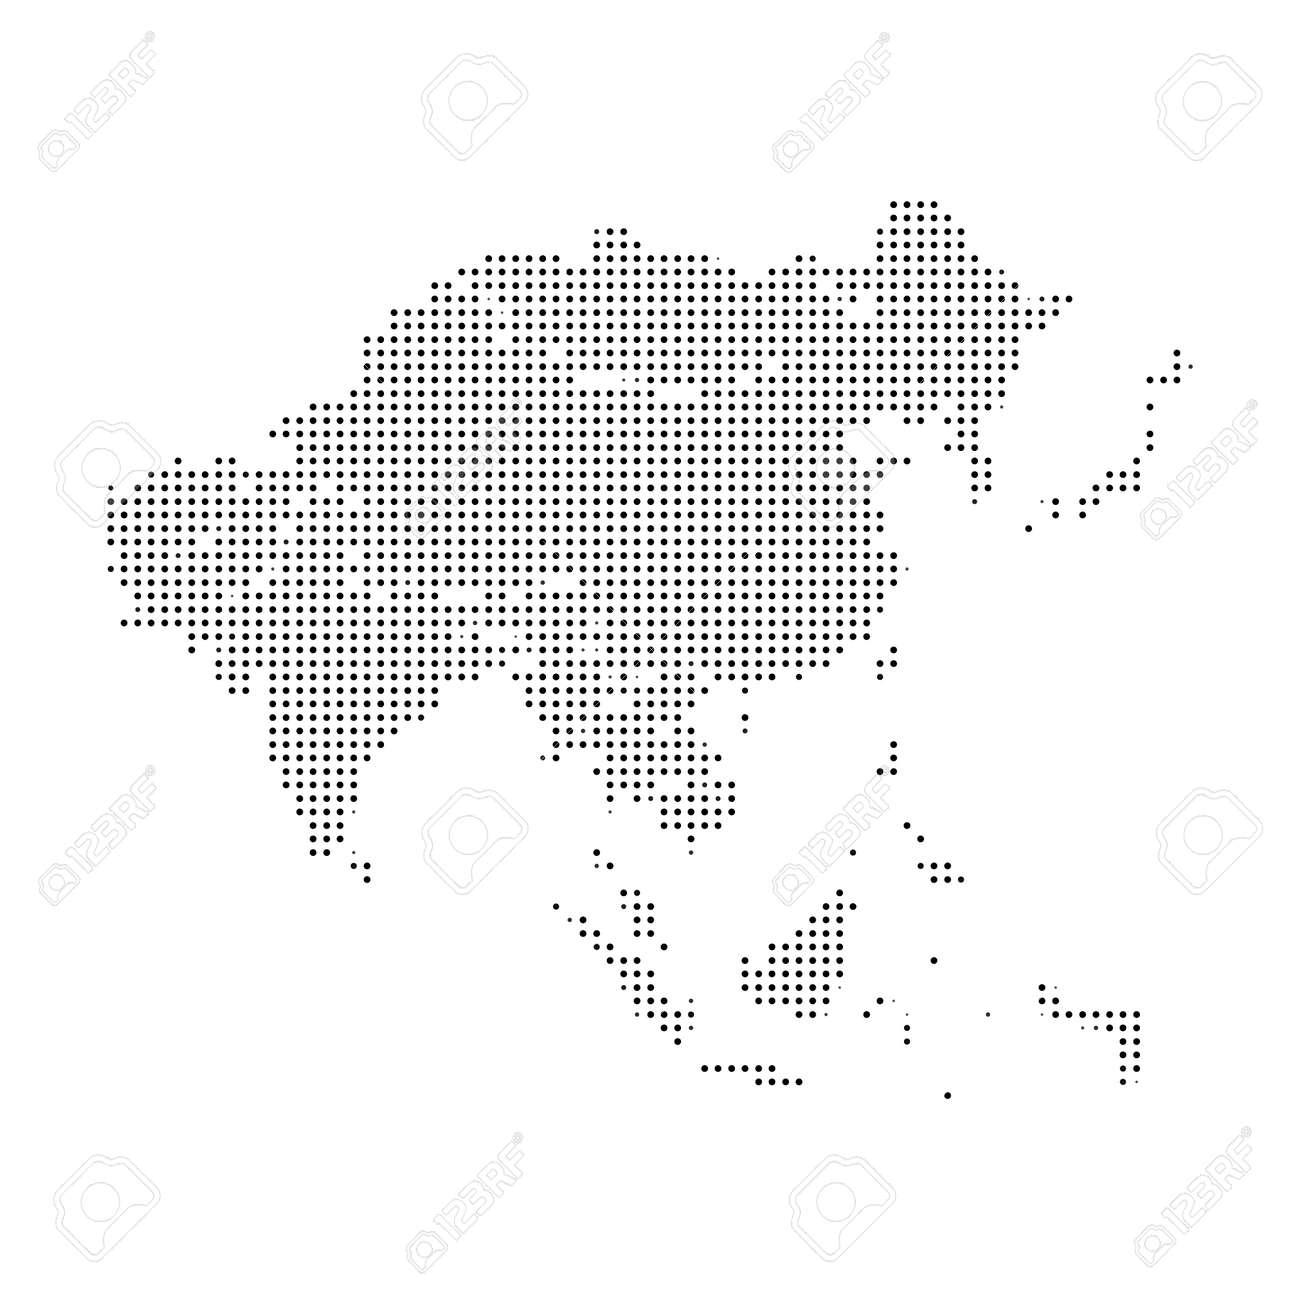 Europe pixel vector map. Square dot pixel Europe map background - 165218877